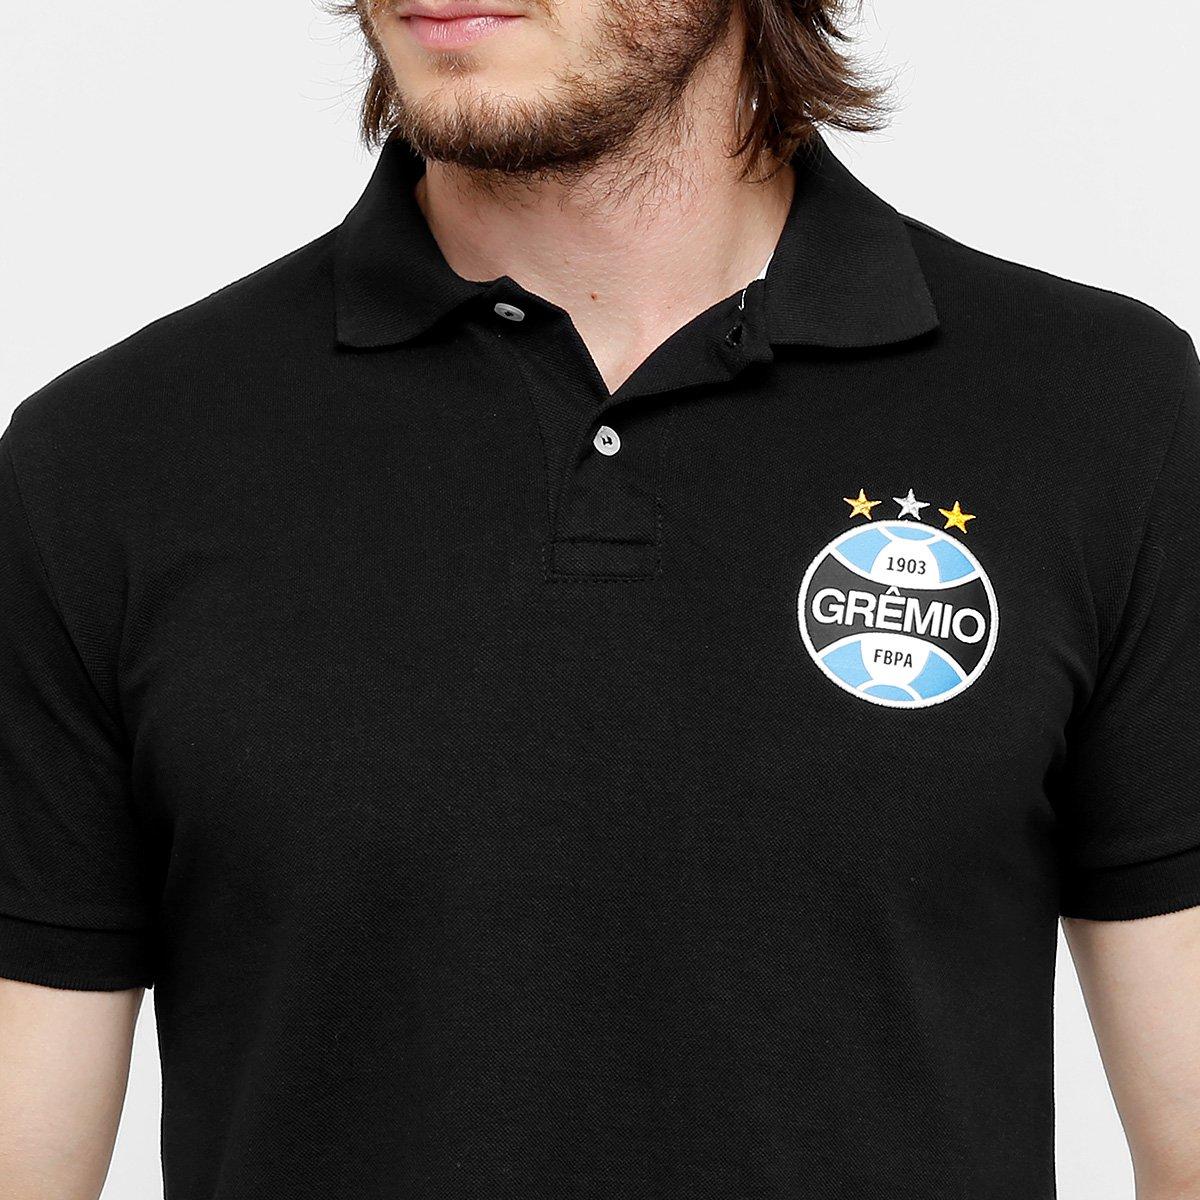 Camisa Polo Grêmio Básica Masculina - Compre Agora  8a7c048fc7066